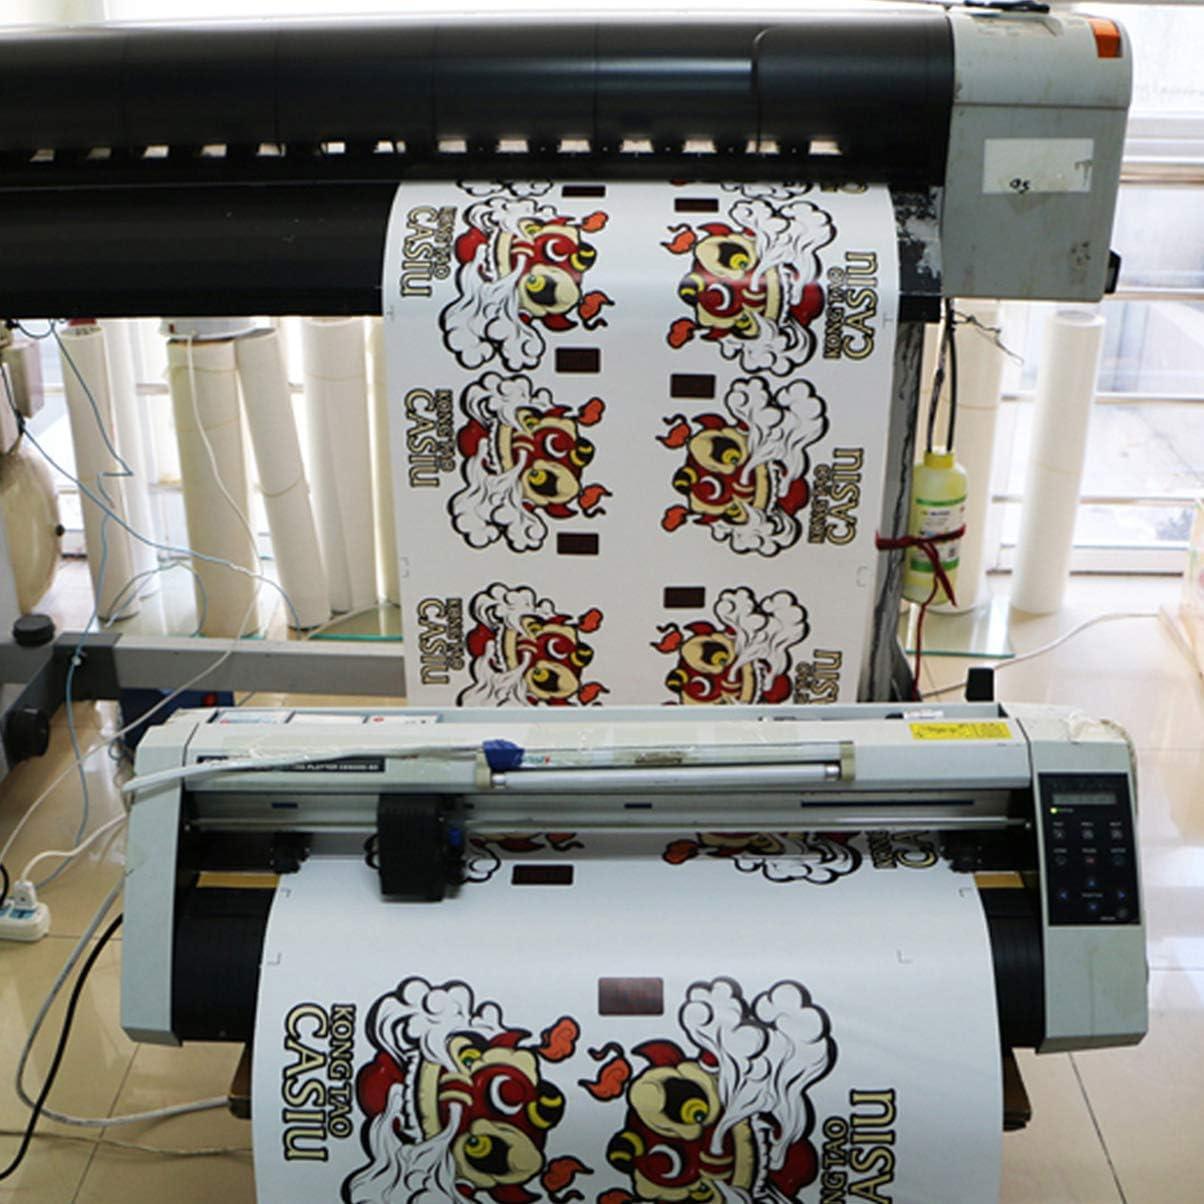 HEALLILY - Vinilo Blanco de Transferencia térmica HTV para Camiseta, Papel de Transferencia, para Ropa, Manualidades, Carpetas para Muebles, 30 x 100 cm: Amazon.es: Hogar